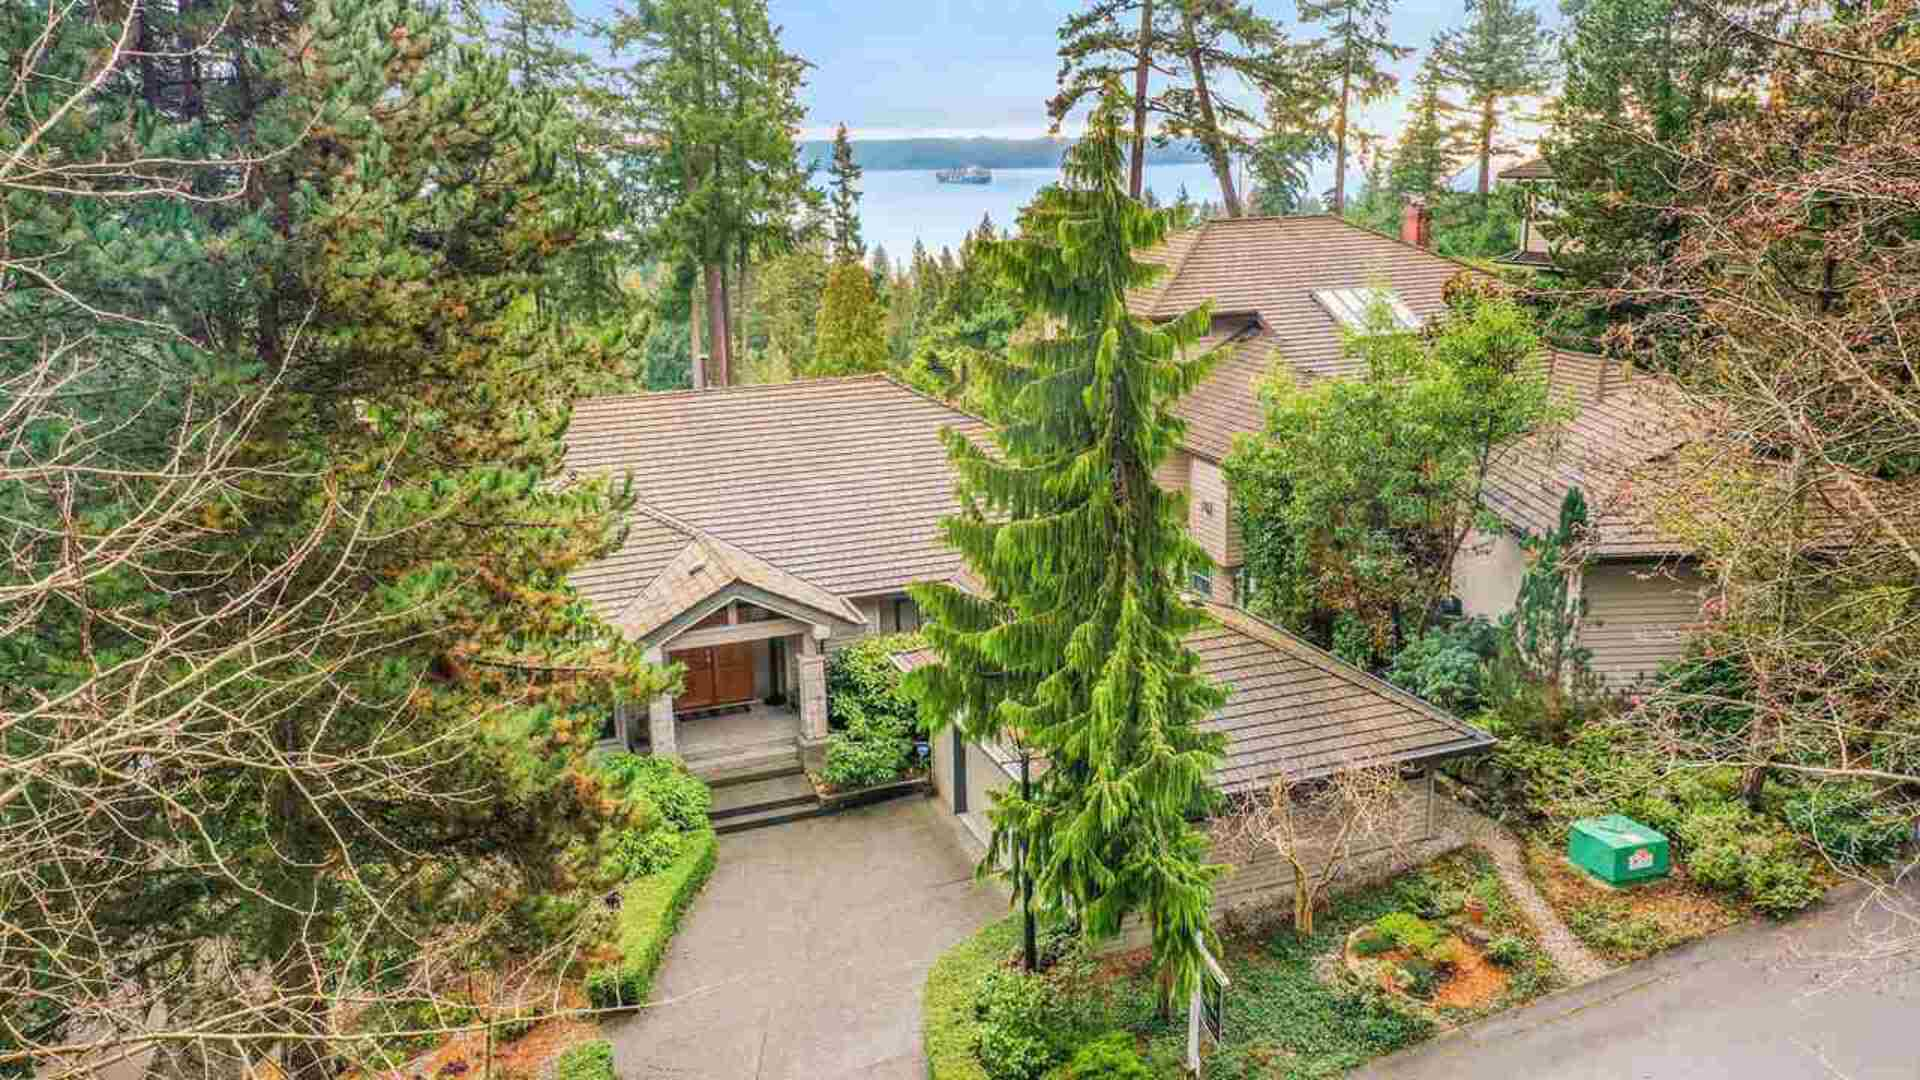 4864-vista-place-caulfeild-west-vancouver-22 at 4864 Vista Place, Caulfeild, West Vancouver